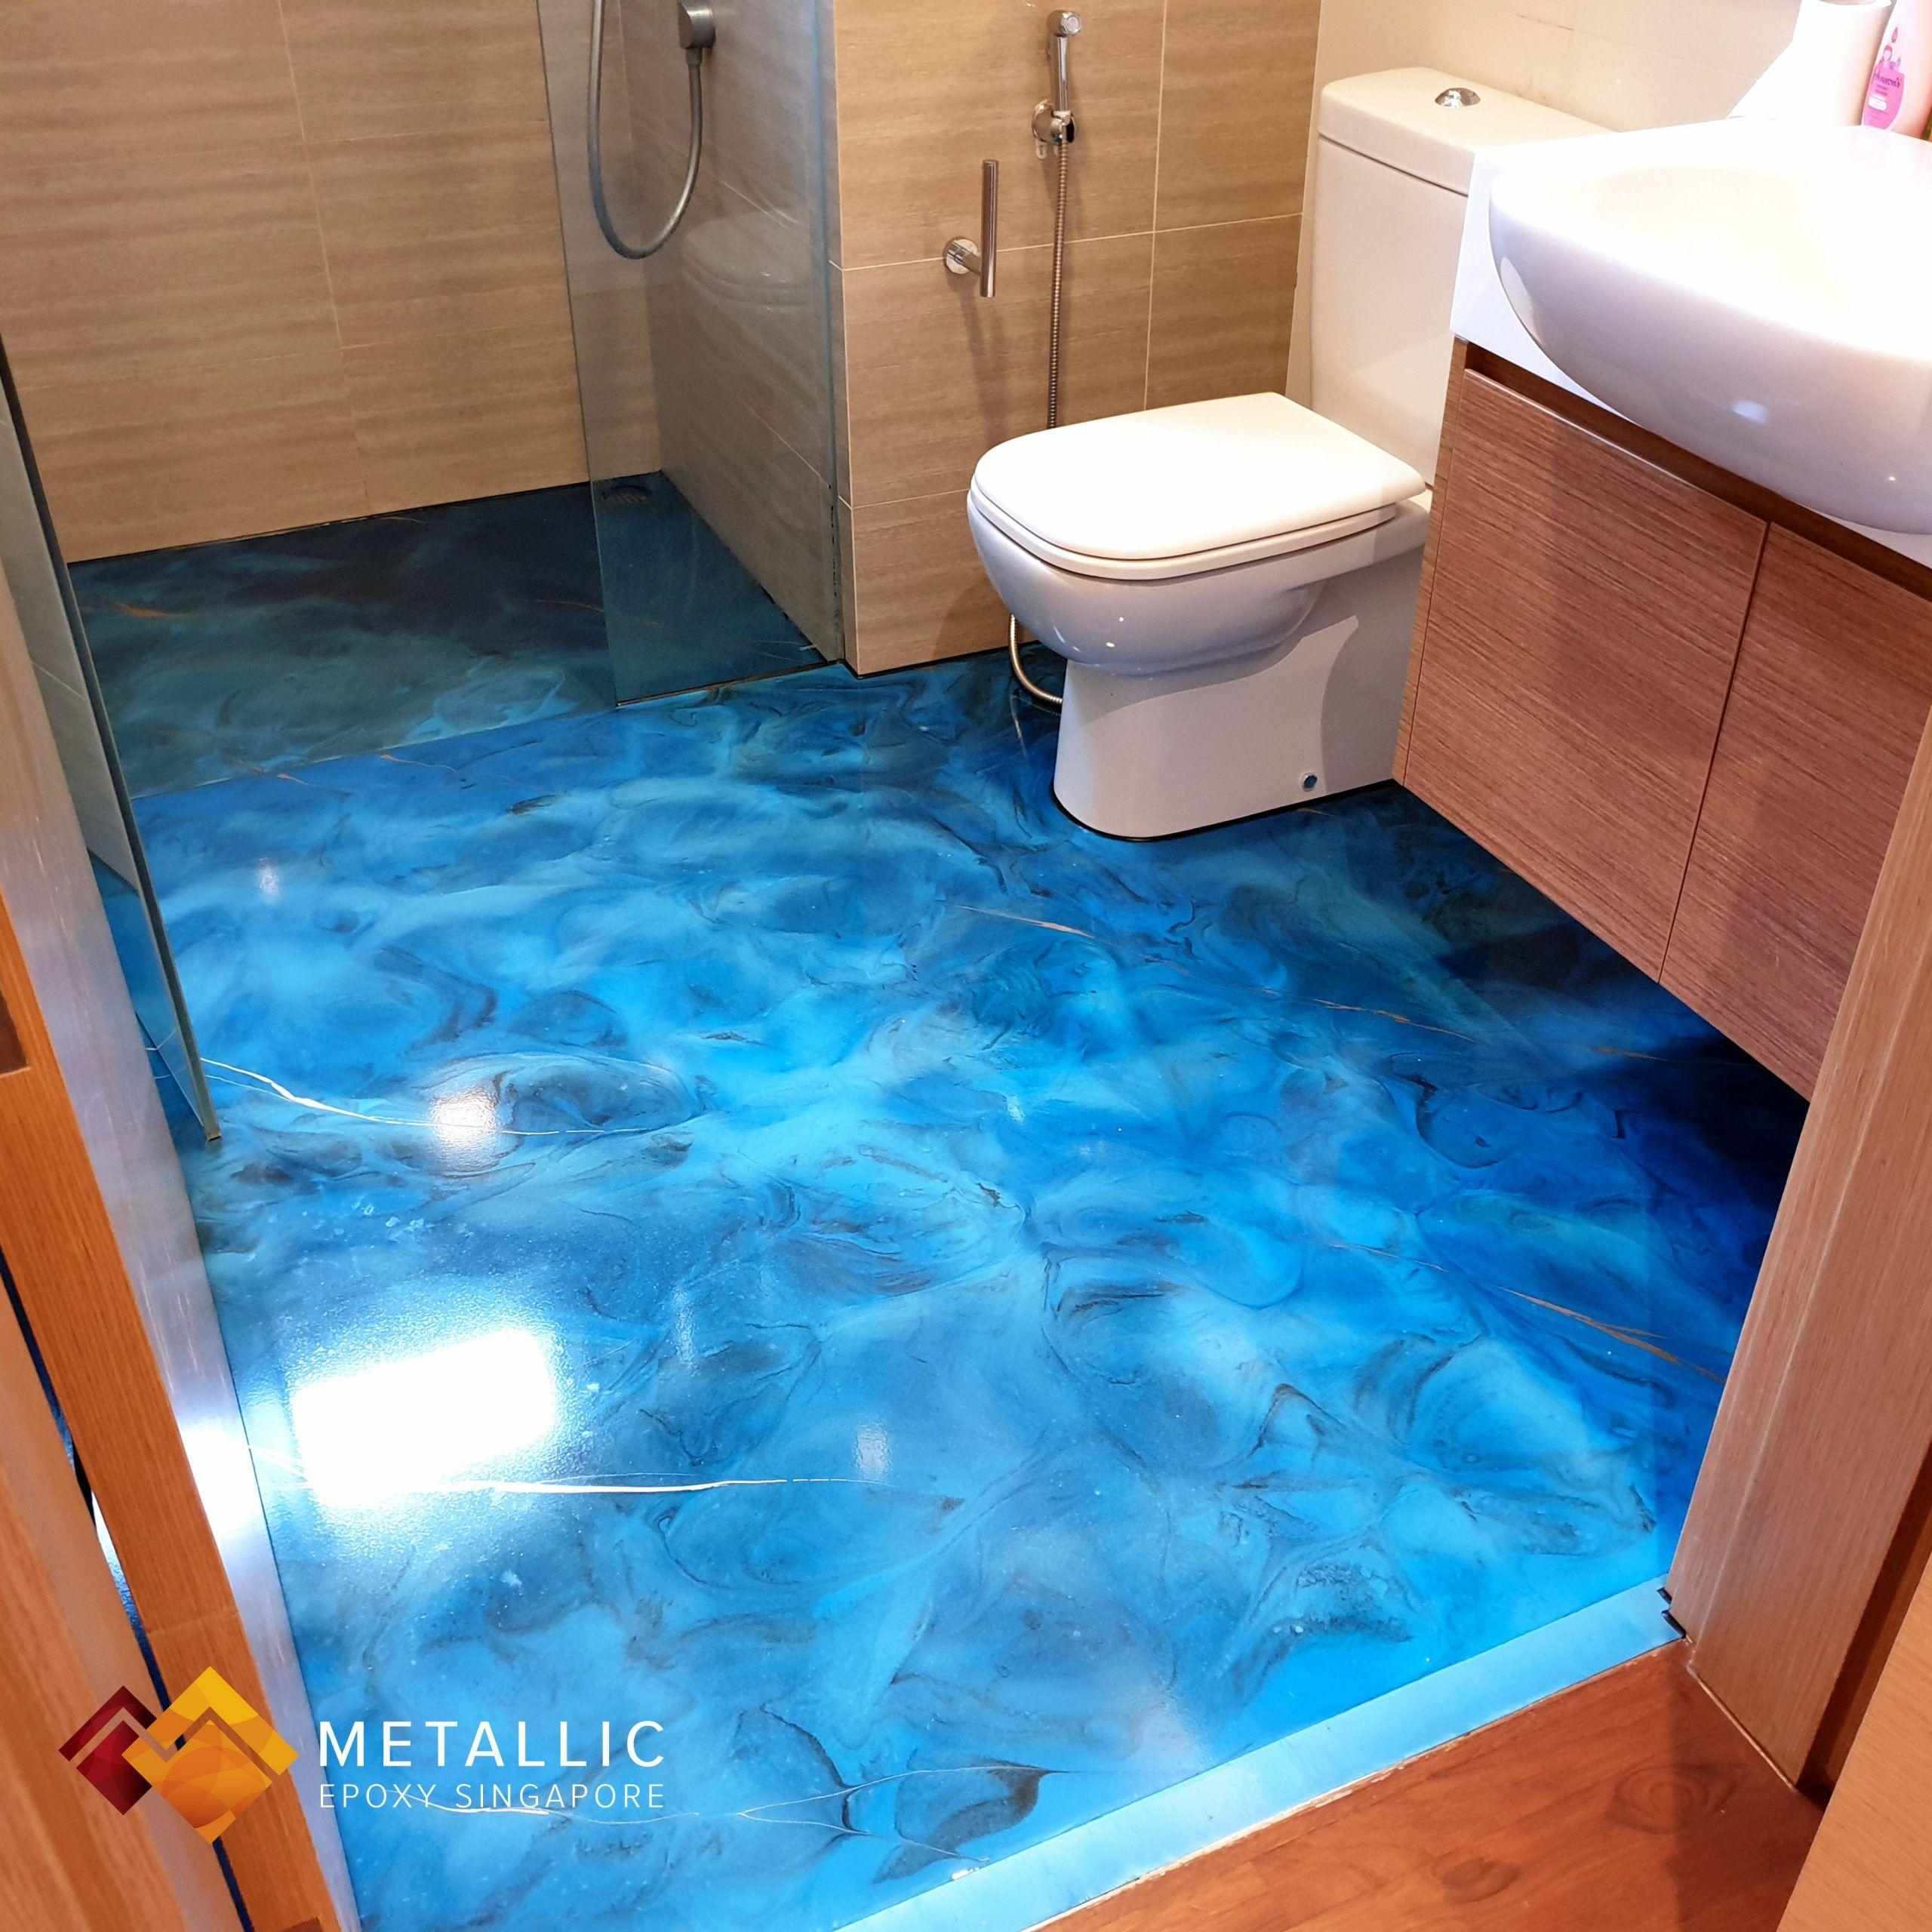 Metallic Epoxy Singapore Gold Black Highlights On Sky Blue Bathroom Floor Bathro In 2020 Badezimmerboden Schwarze Highlights Blau